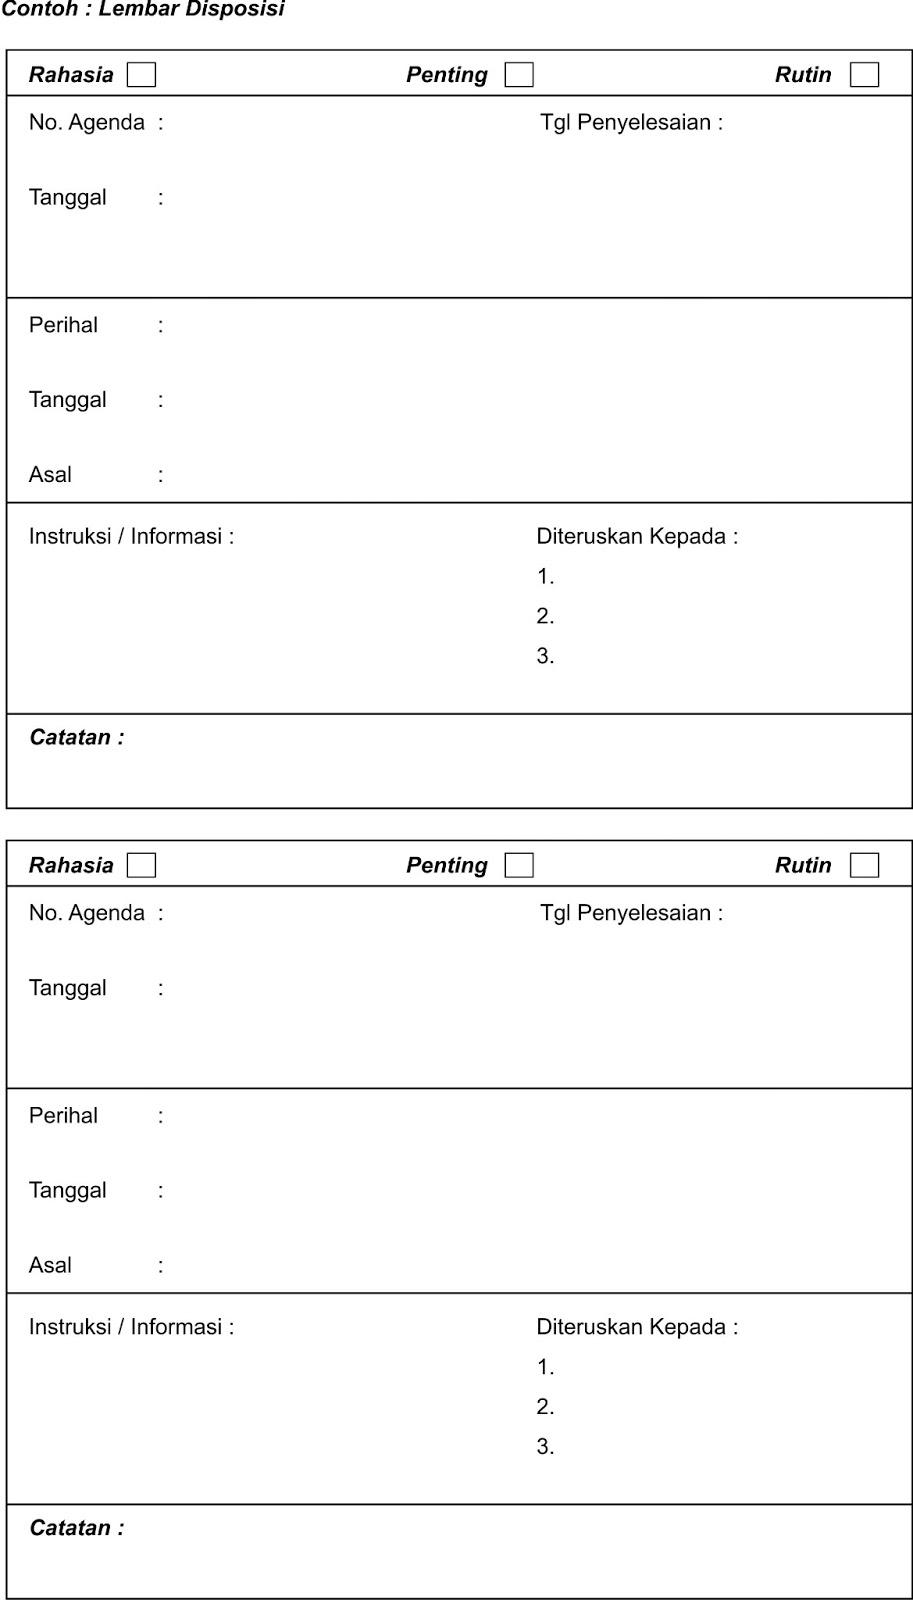 Contoh Lembar Disposisi : contoh, lembar, disposisi, Contoh, Lembar, Disposisi, Surat